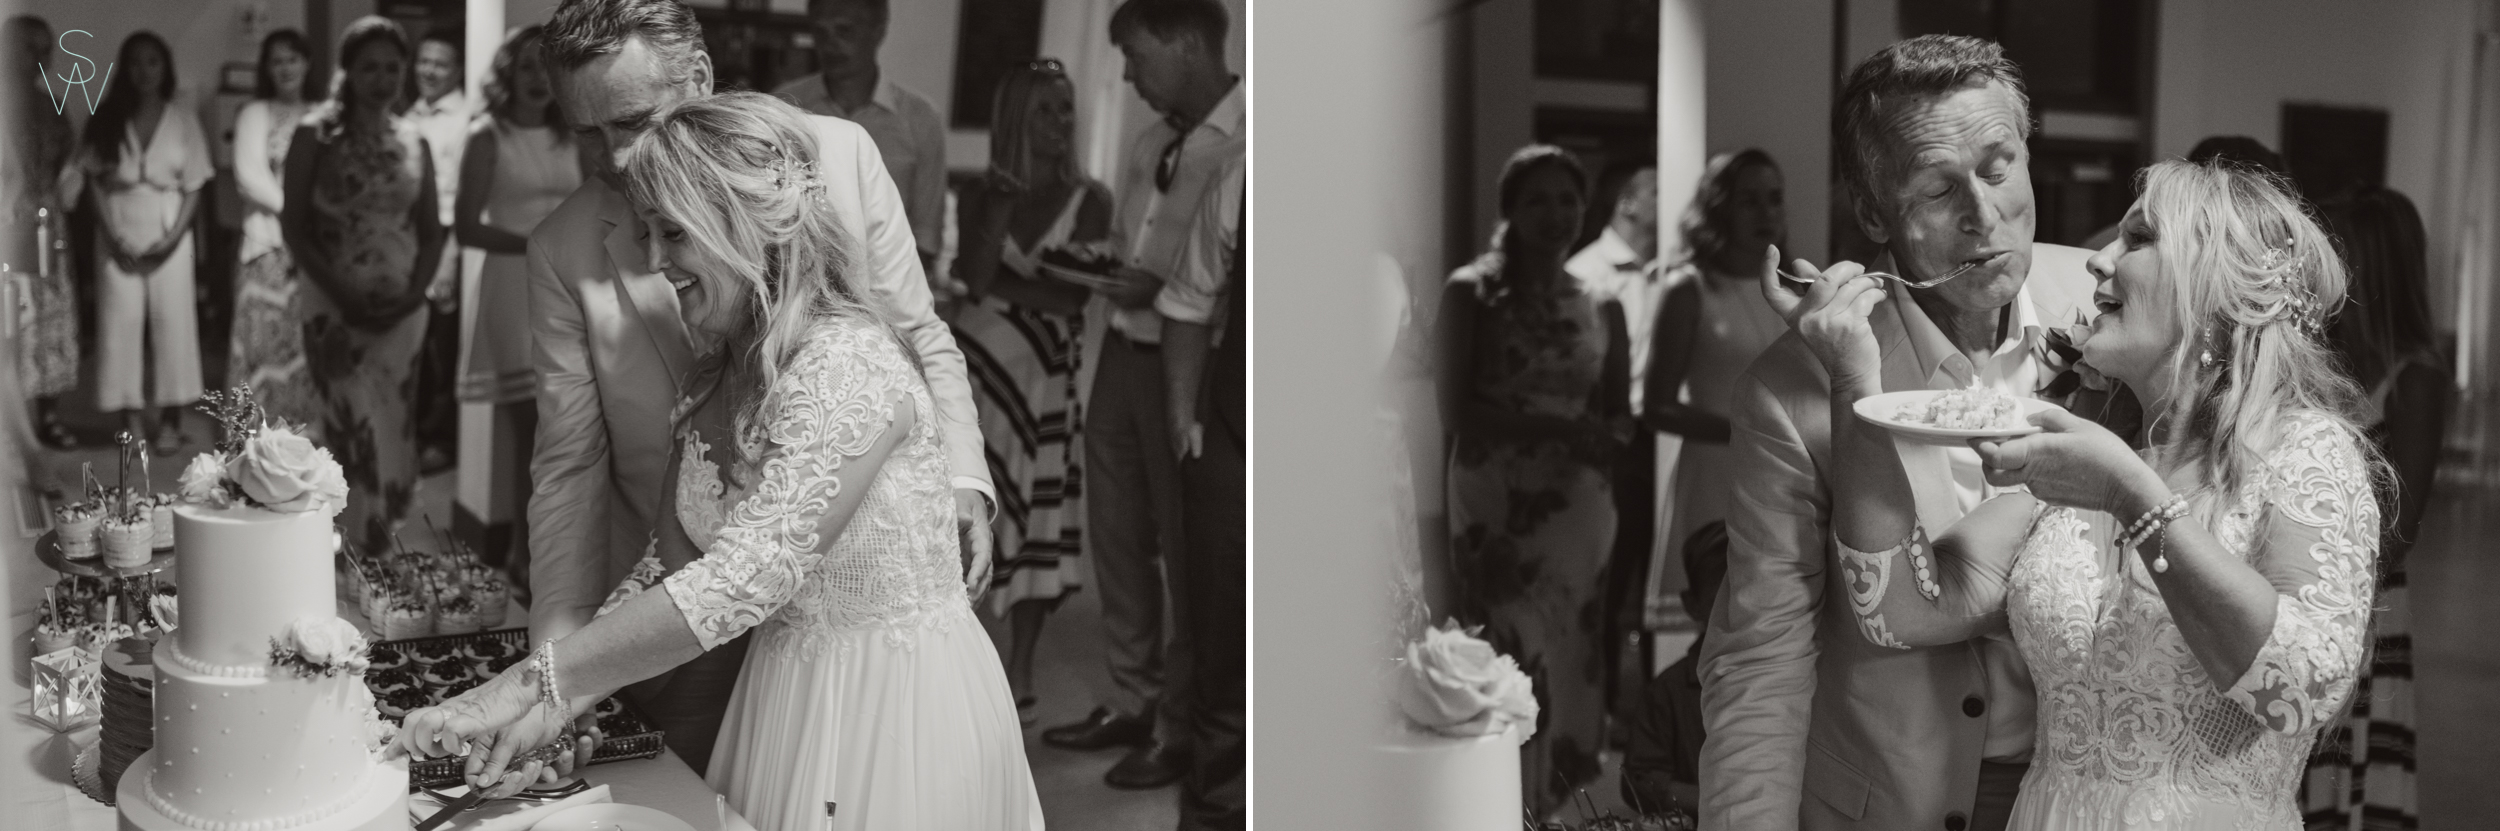 172DEL.MAR.WEDDINGS.cakecutting.photography.shewanders.JPG